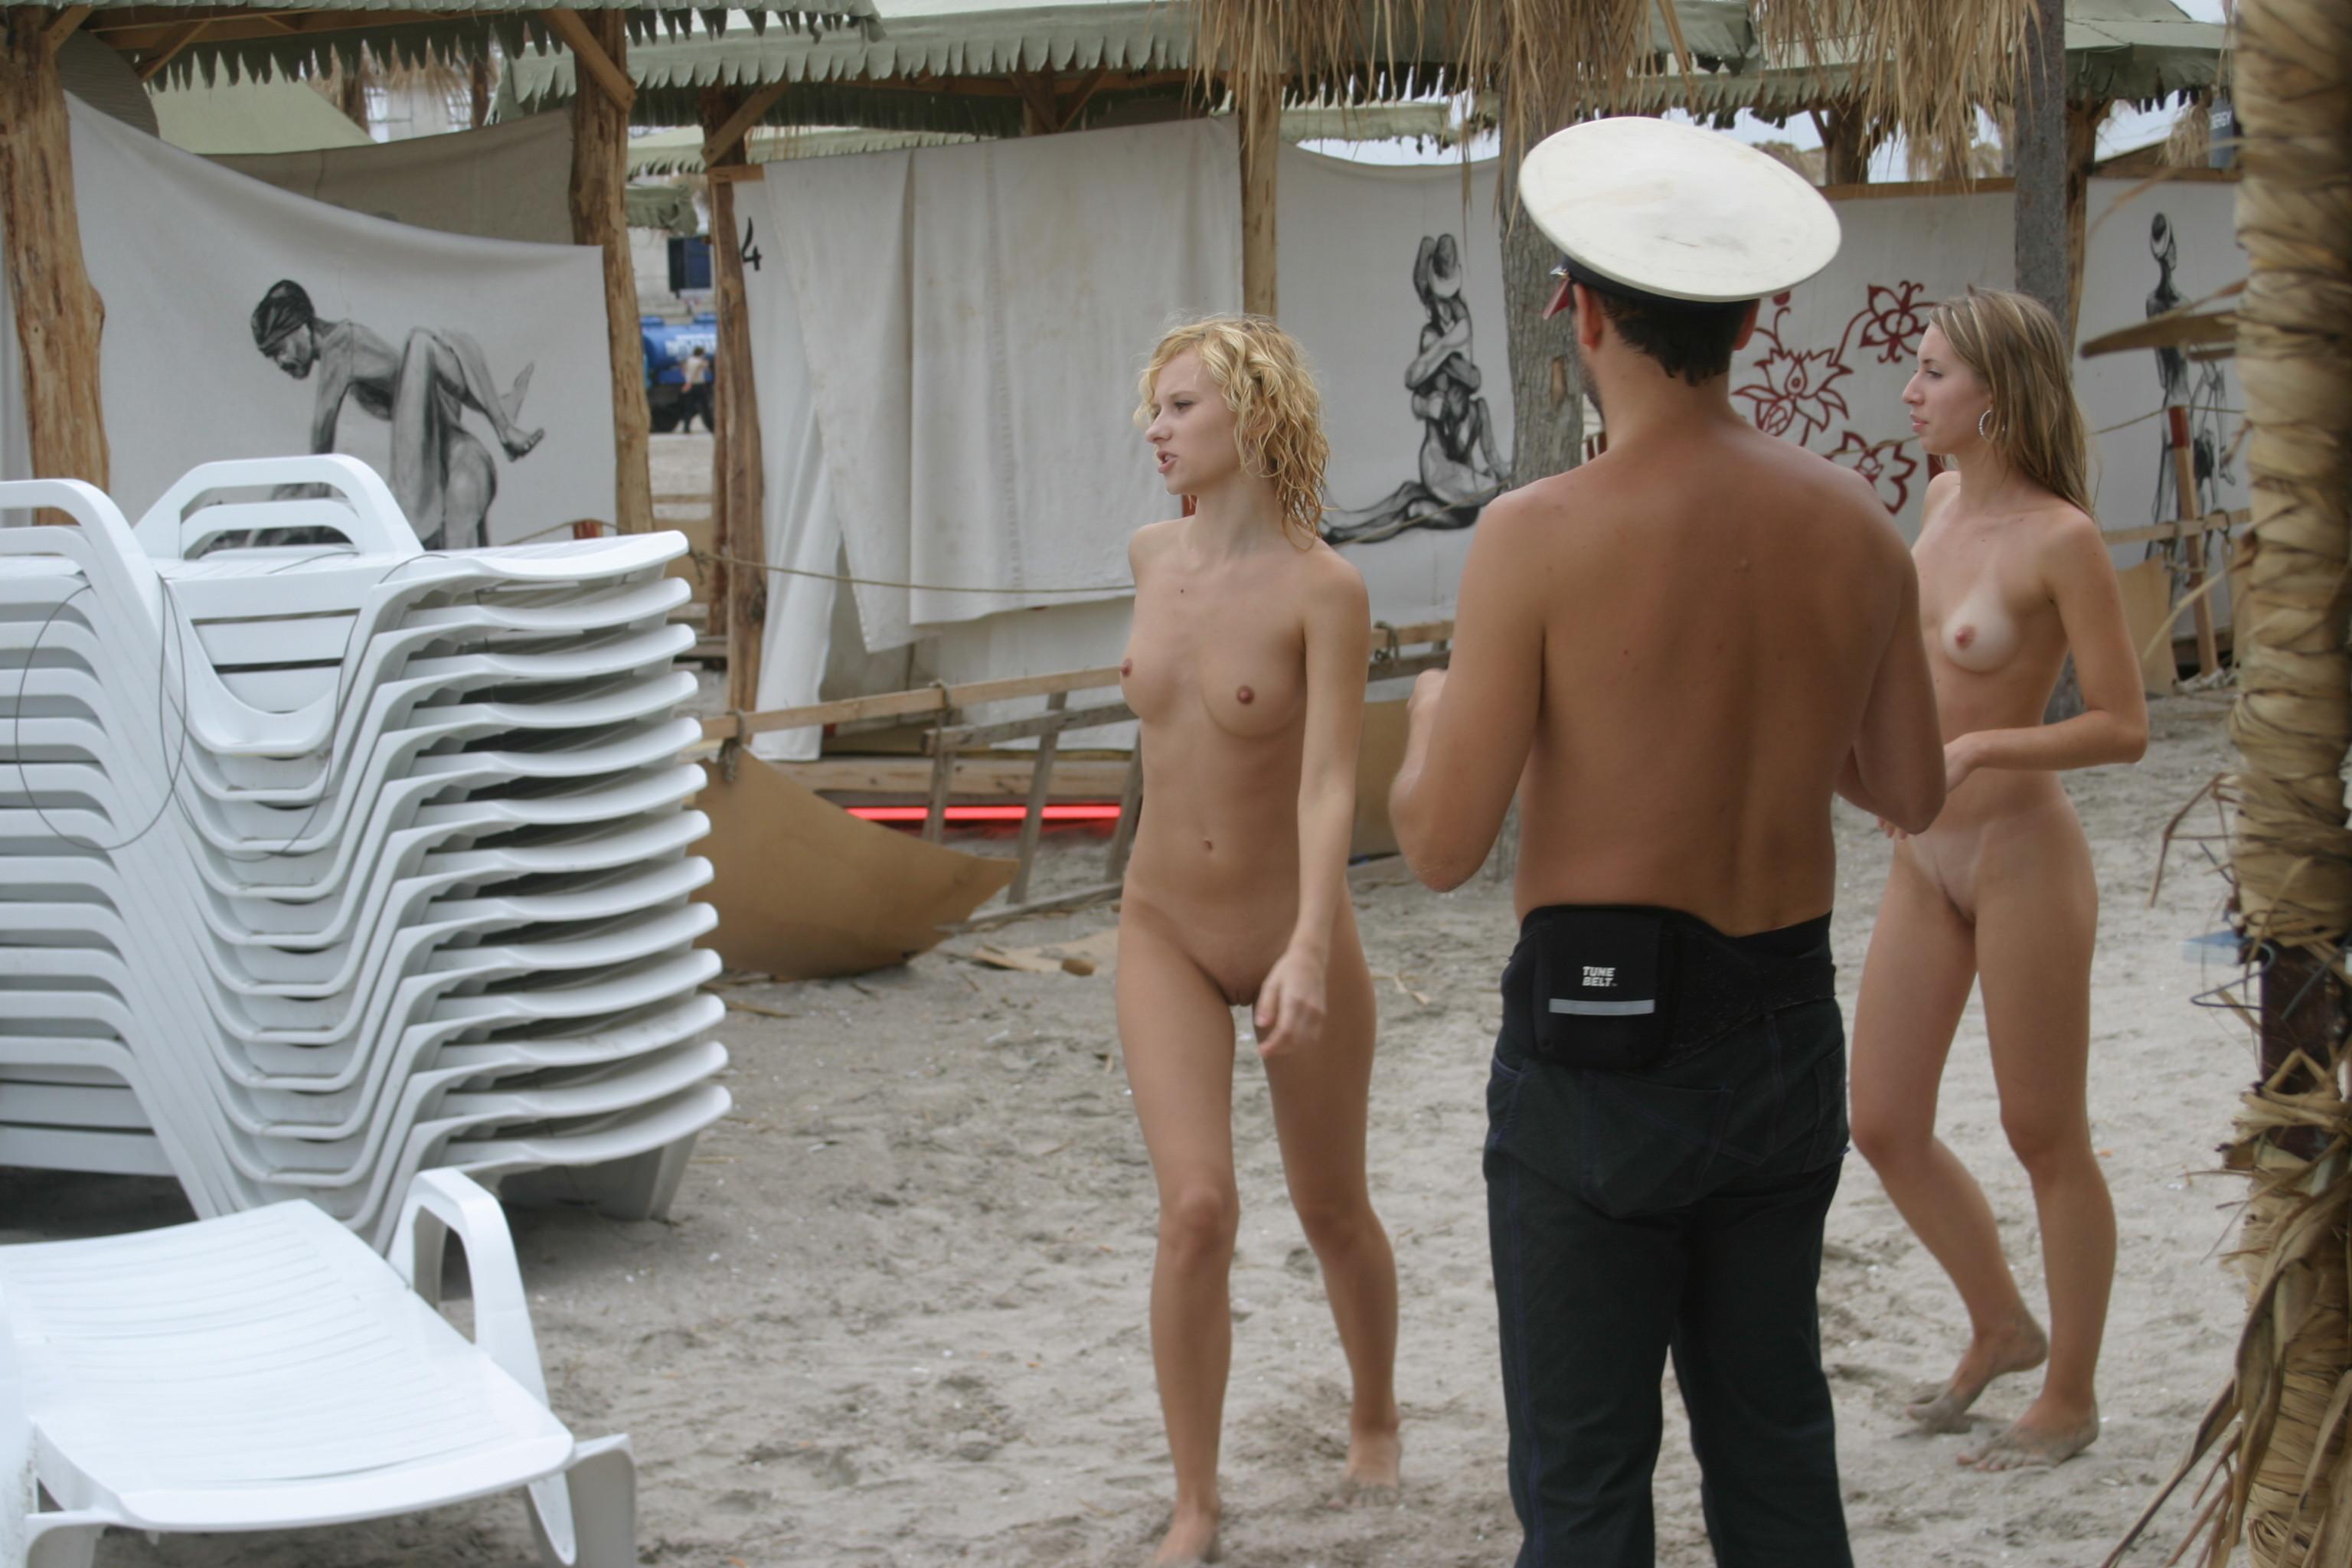 vika-y-lena-l-beach-nude-in-public-metart-08